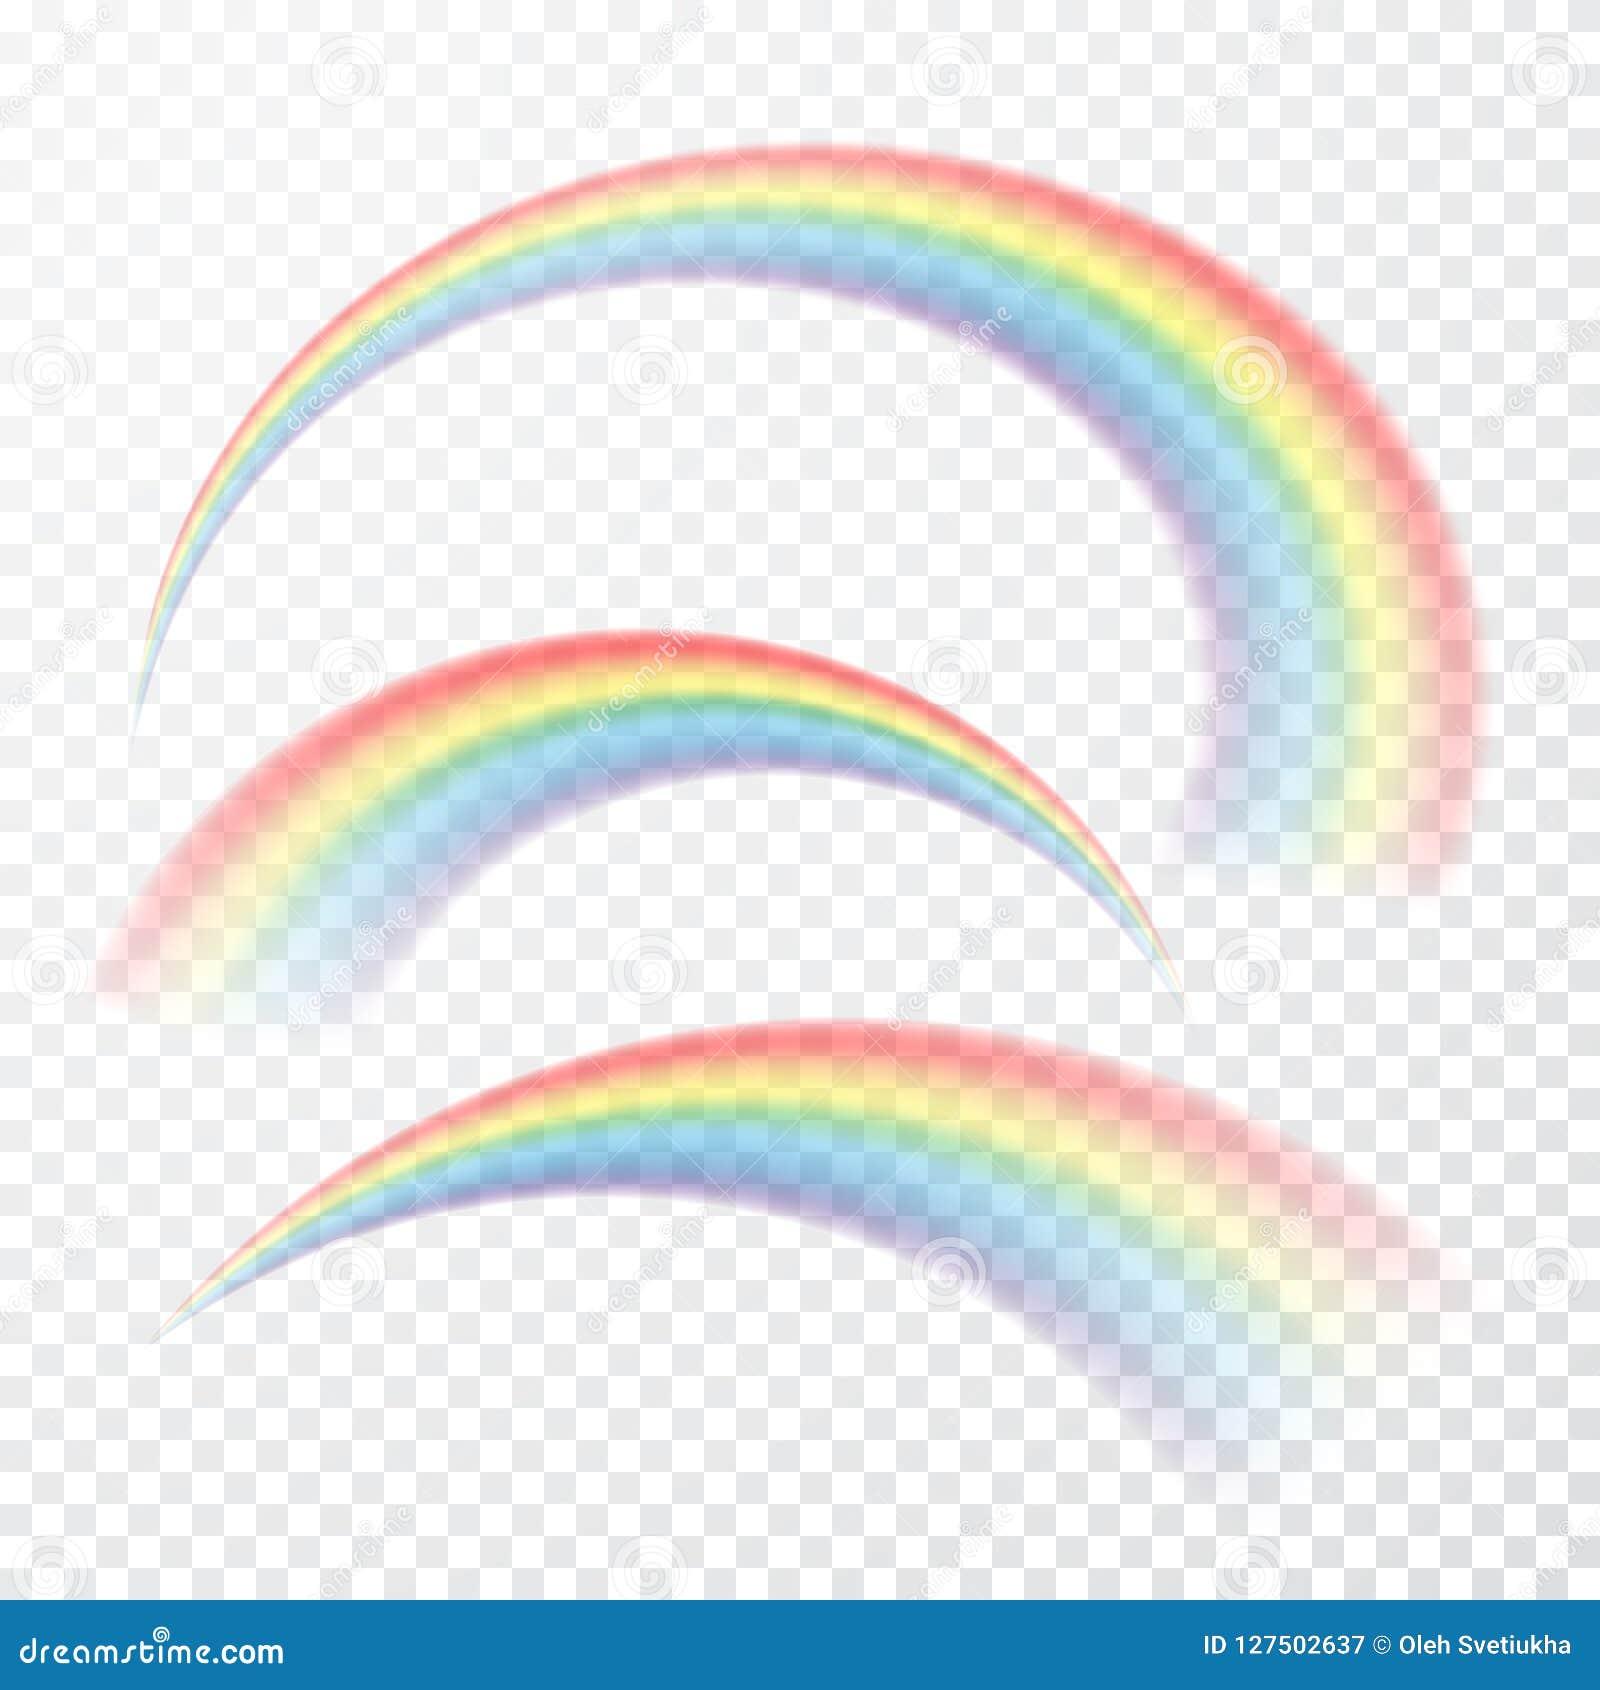 Transparent rainbow. Vector illustration. Realistic raibow on transparent background